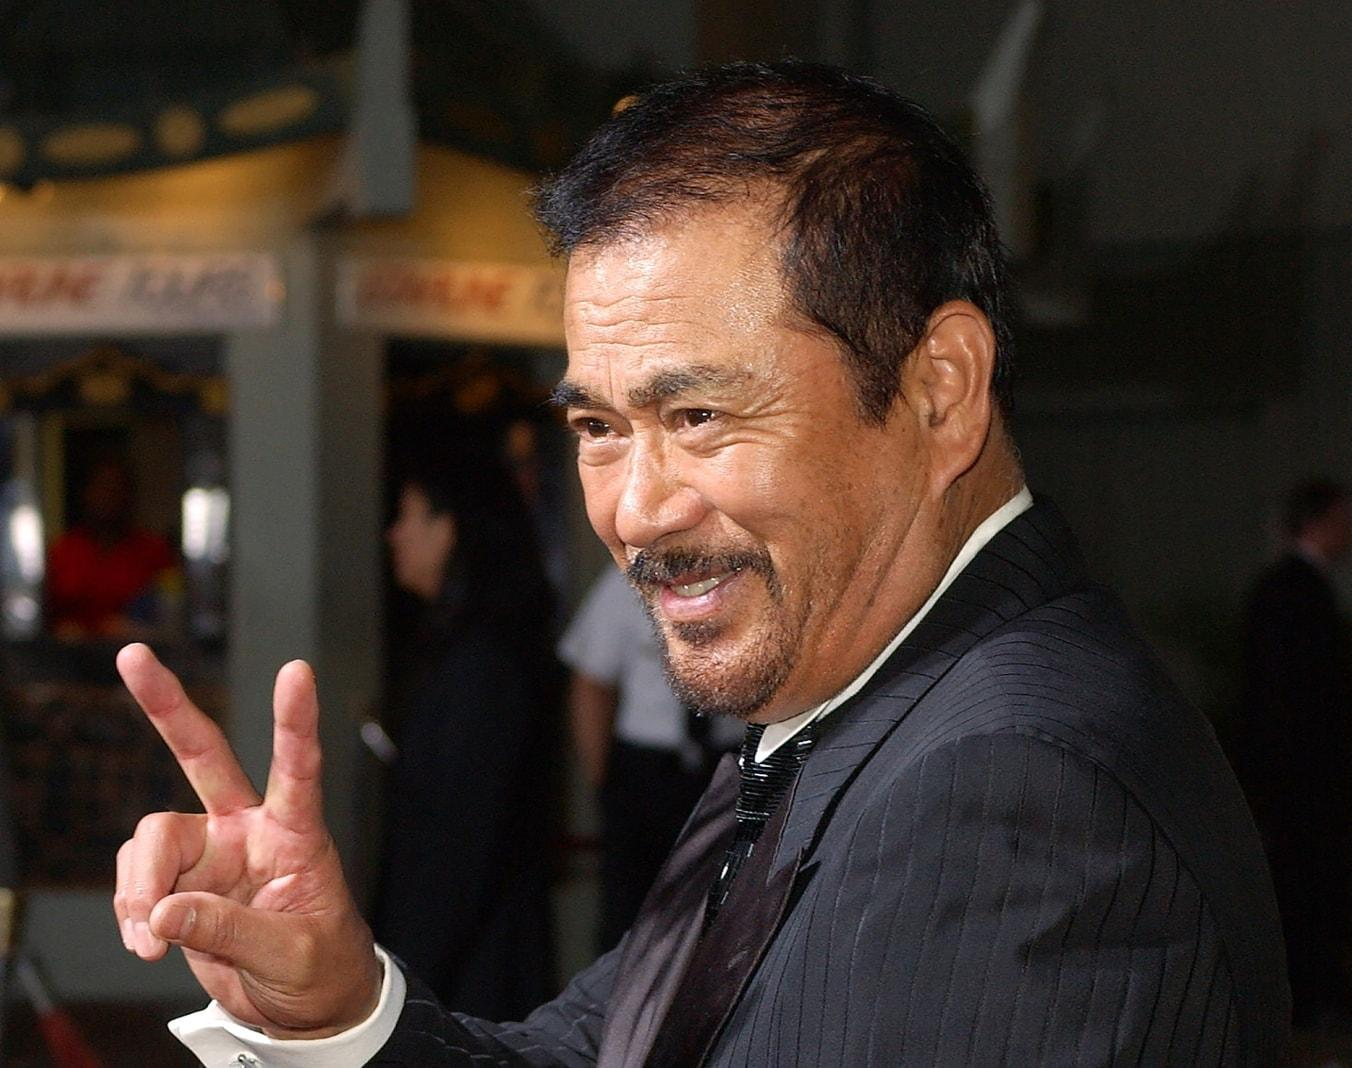 Sonny Chiba gestorben